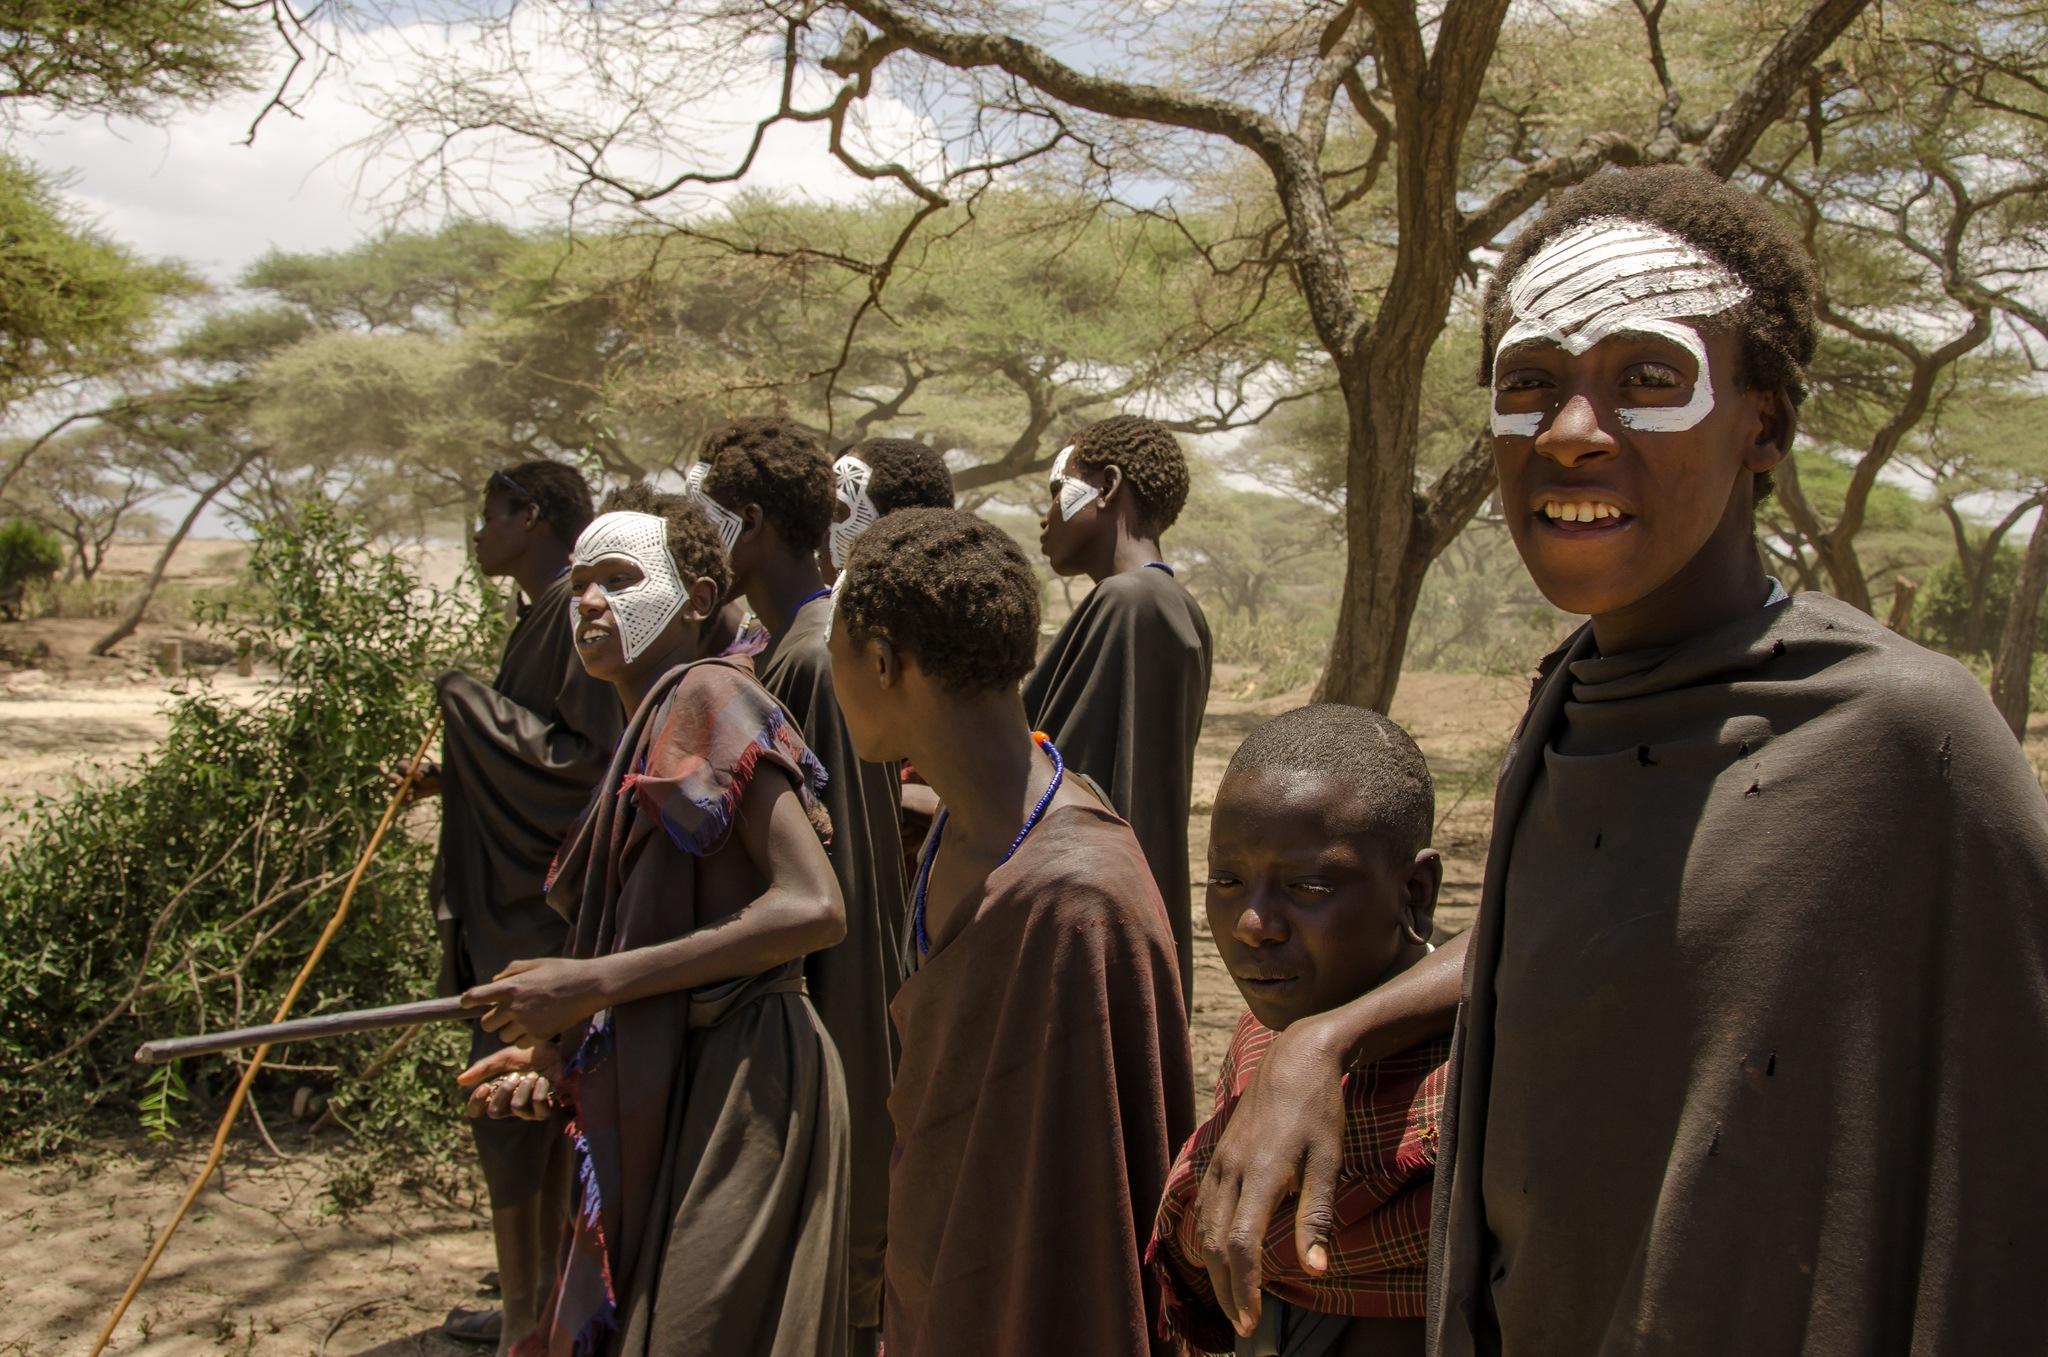 Young Maasai boys, Ngorongoro Crater in Tanzania